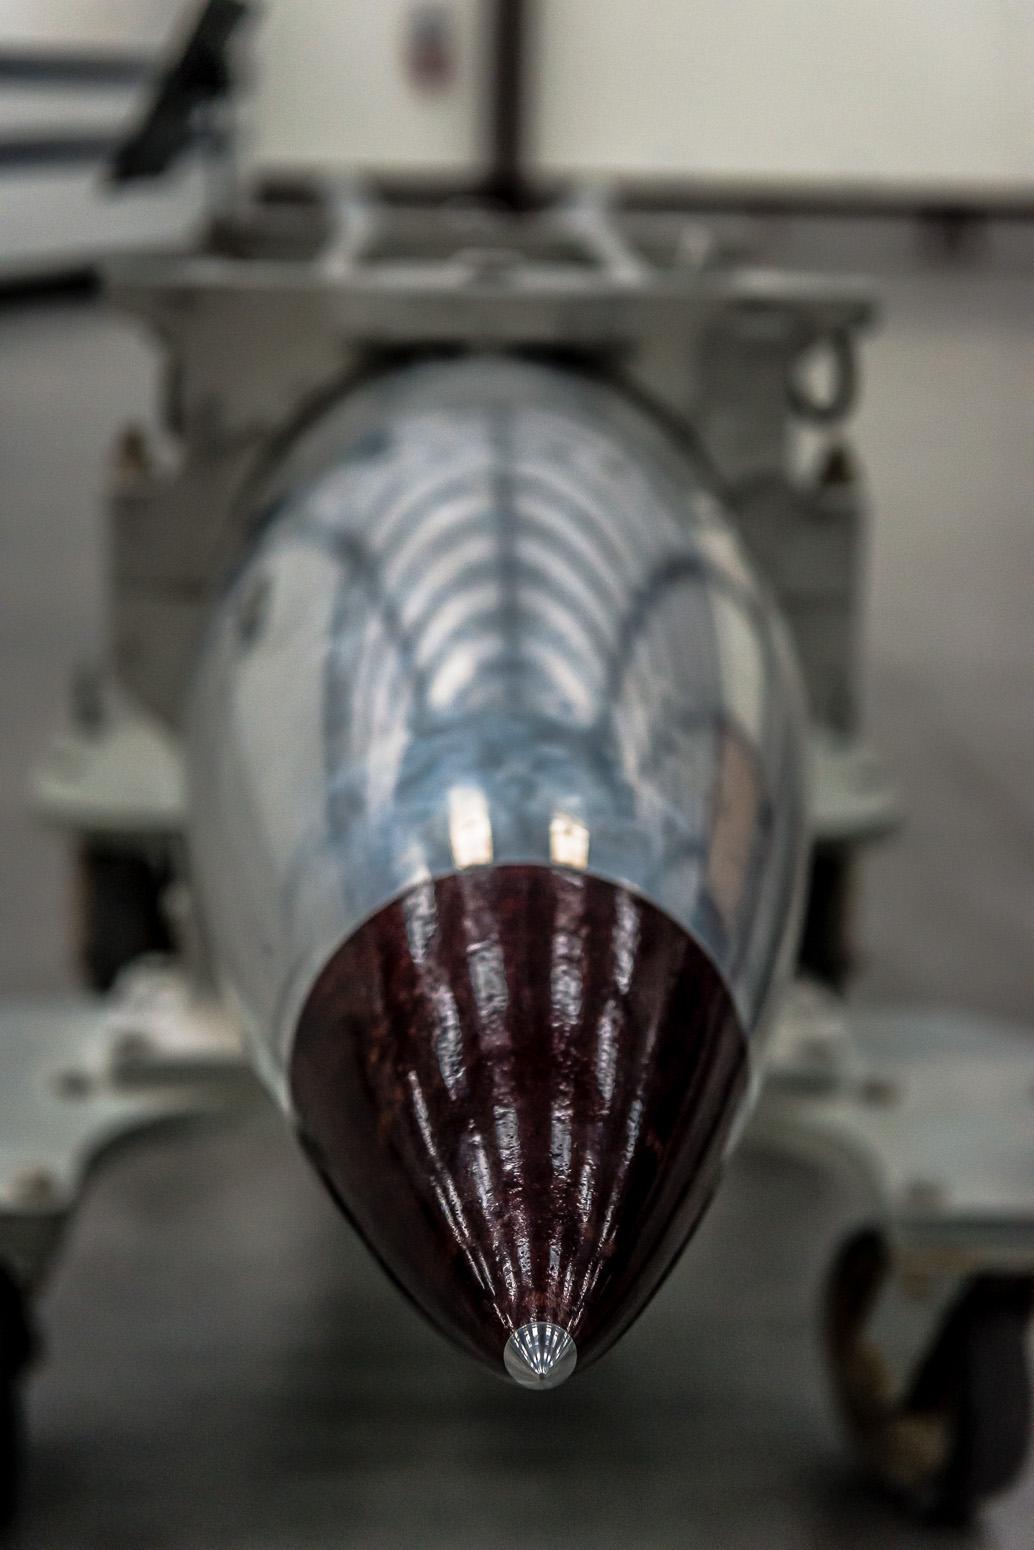 B61 Nuclear Bomb, 20x Hiroshima Payload, Pima Air & Space Museum , Tucson, USA